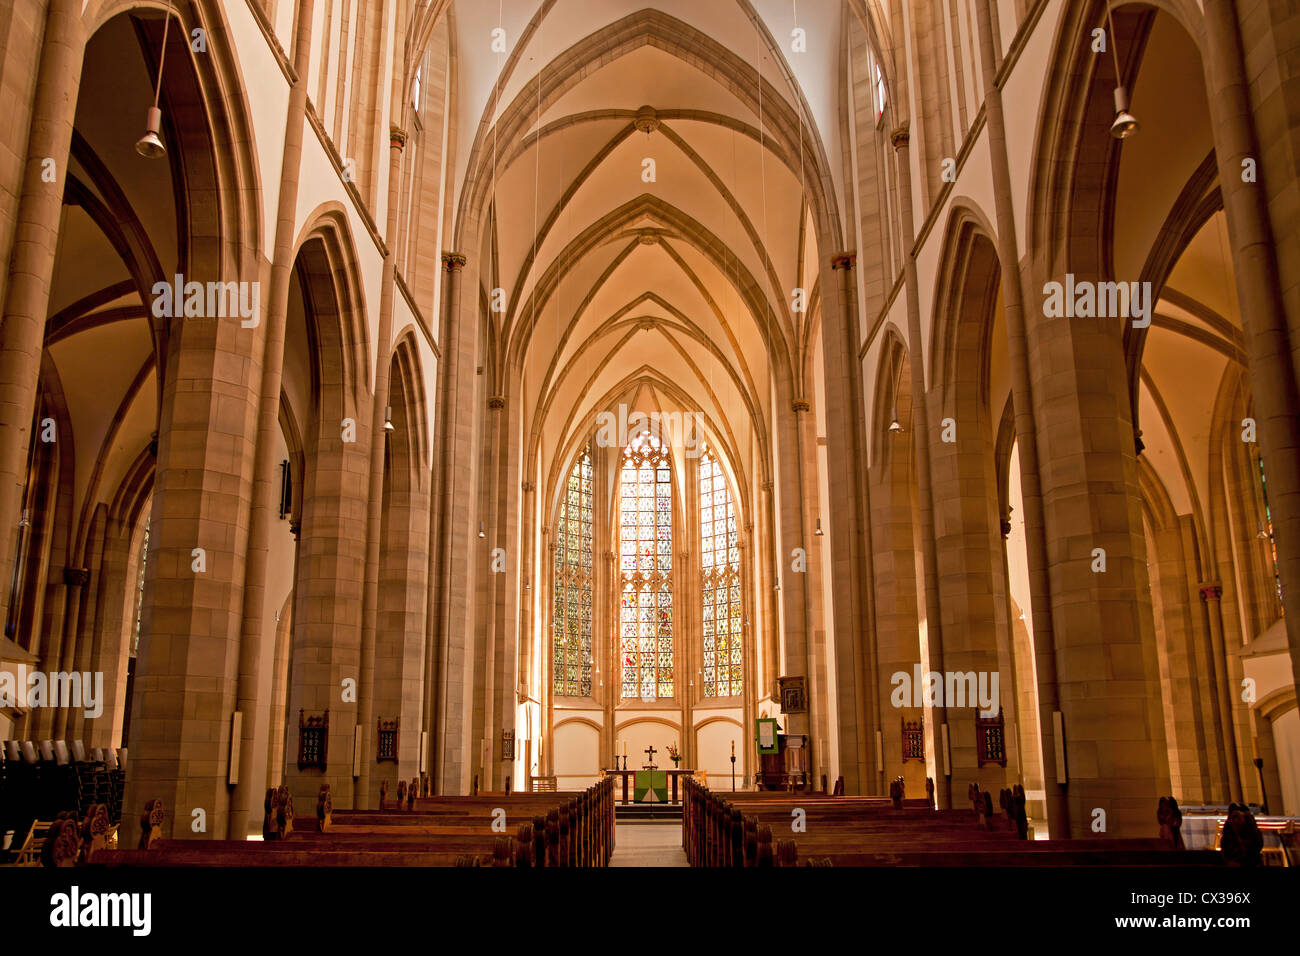 inside of the church Salvatorkirche in Duisburg, North Rhine-Westphalia, Germany, Europe - Stock Image